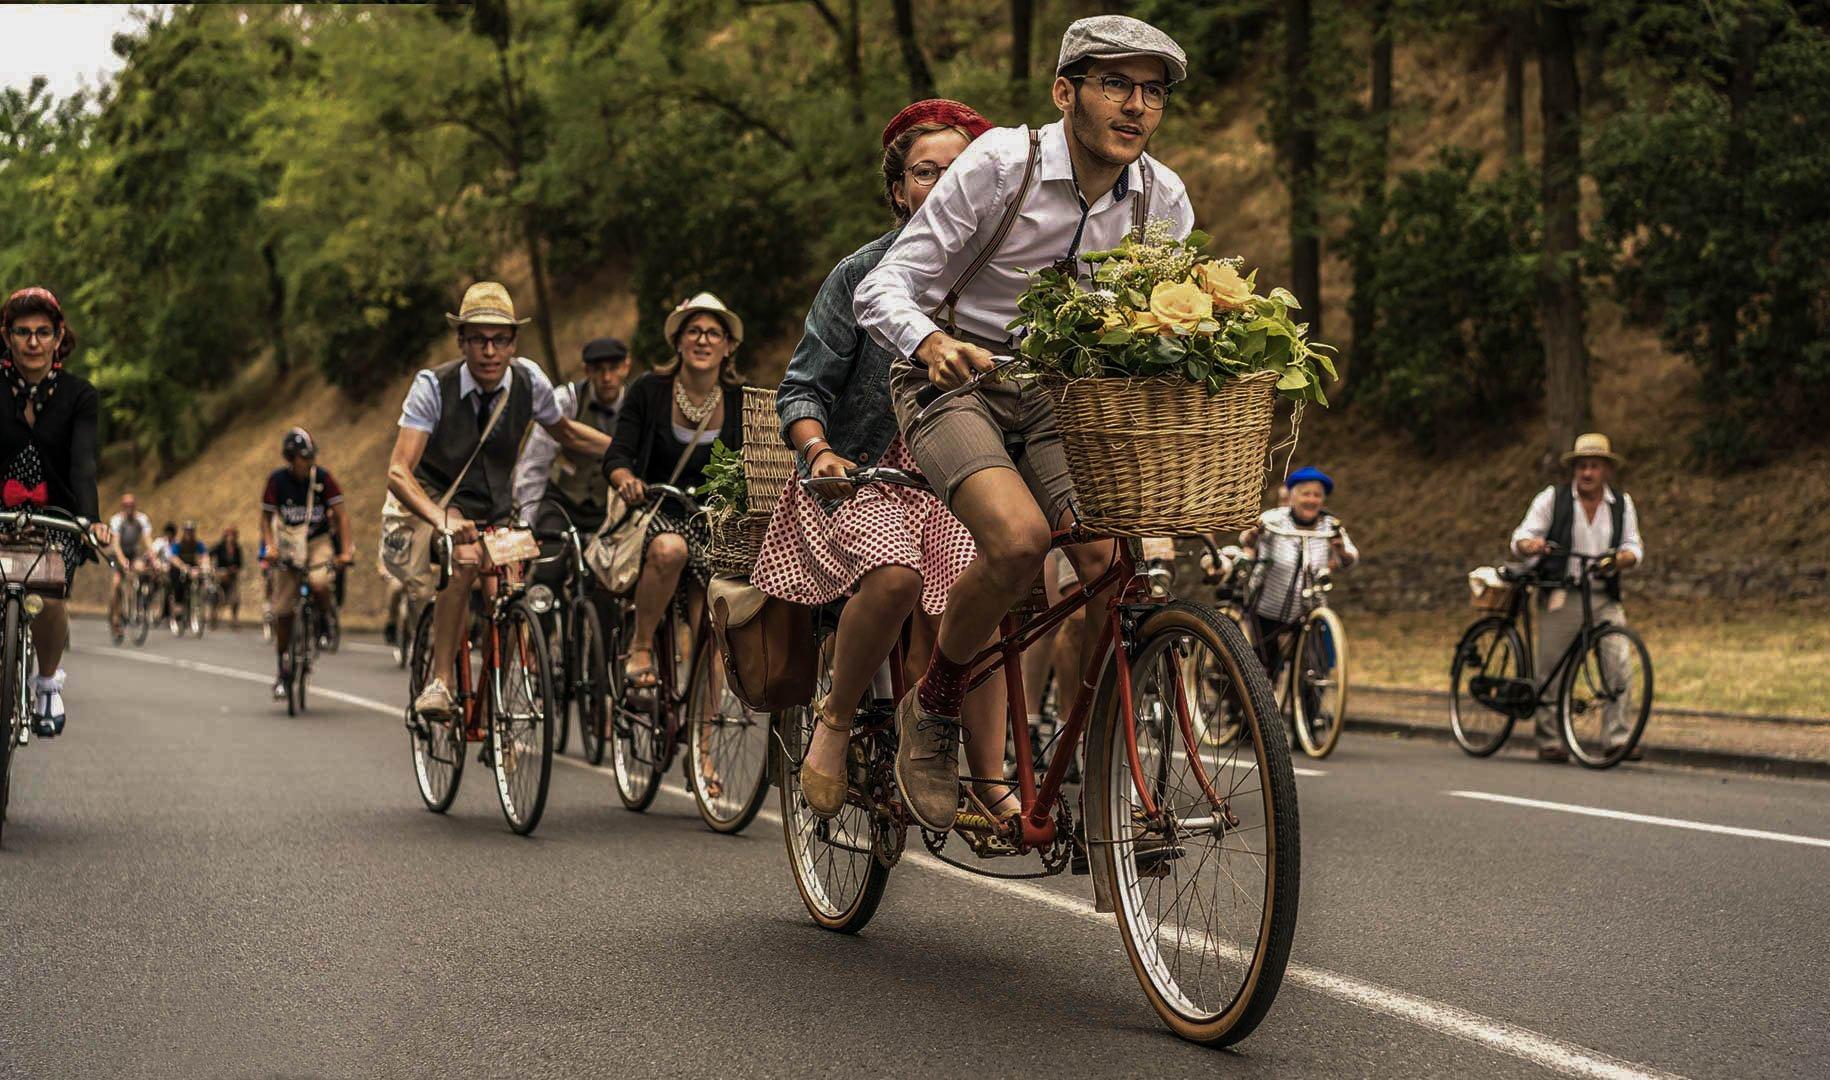 Rassemblement Anjou Vélo Vintage - Classical Bicycles